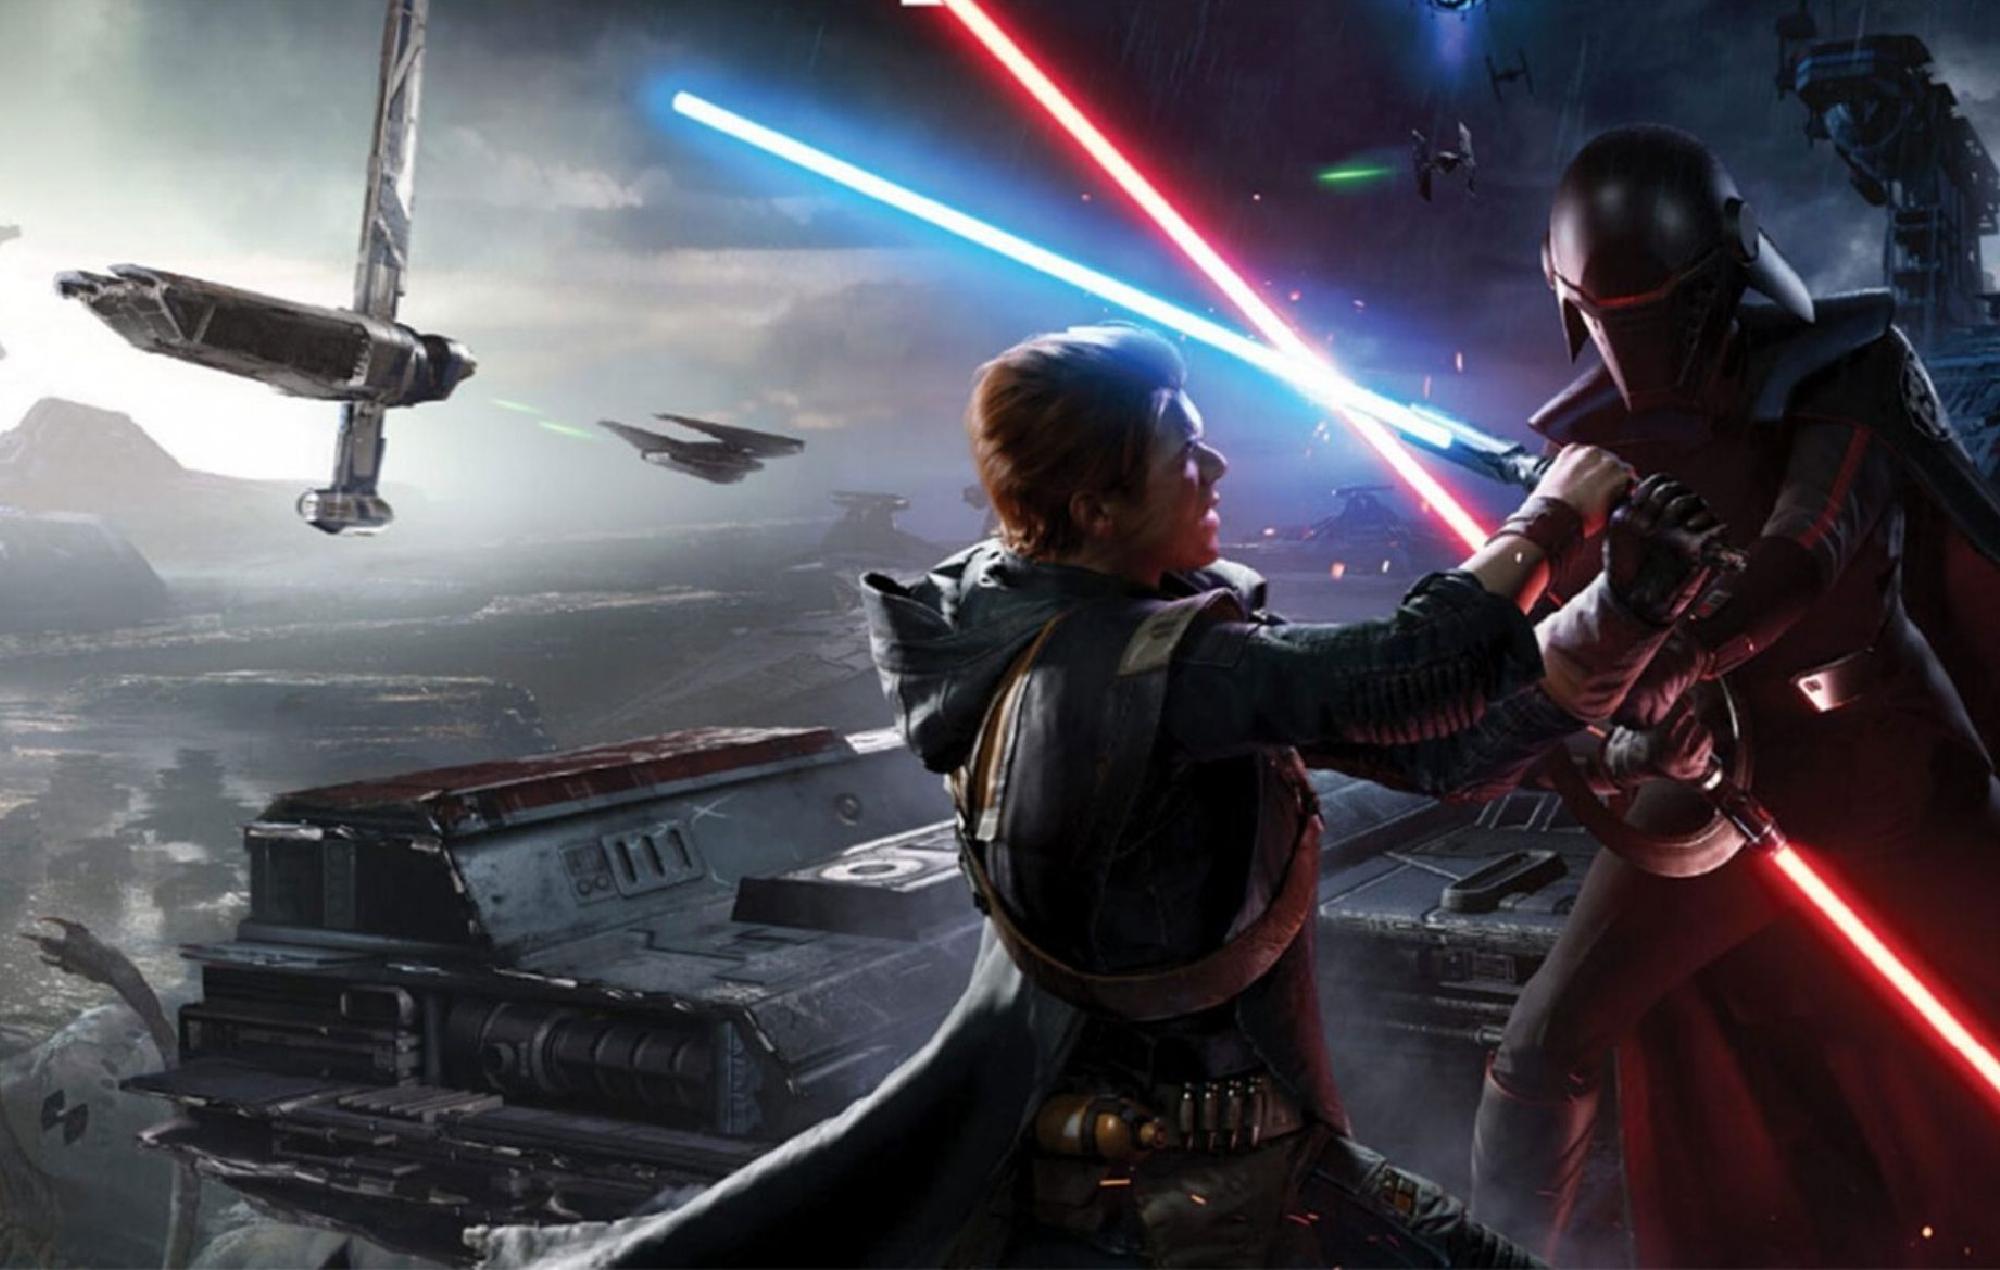 EA confirms 'Star Wars Jedi: Fallen Order' kicks off a new franchise | NME